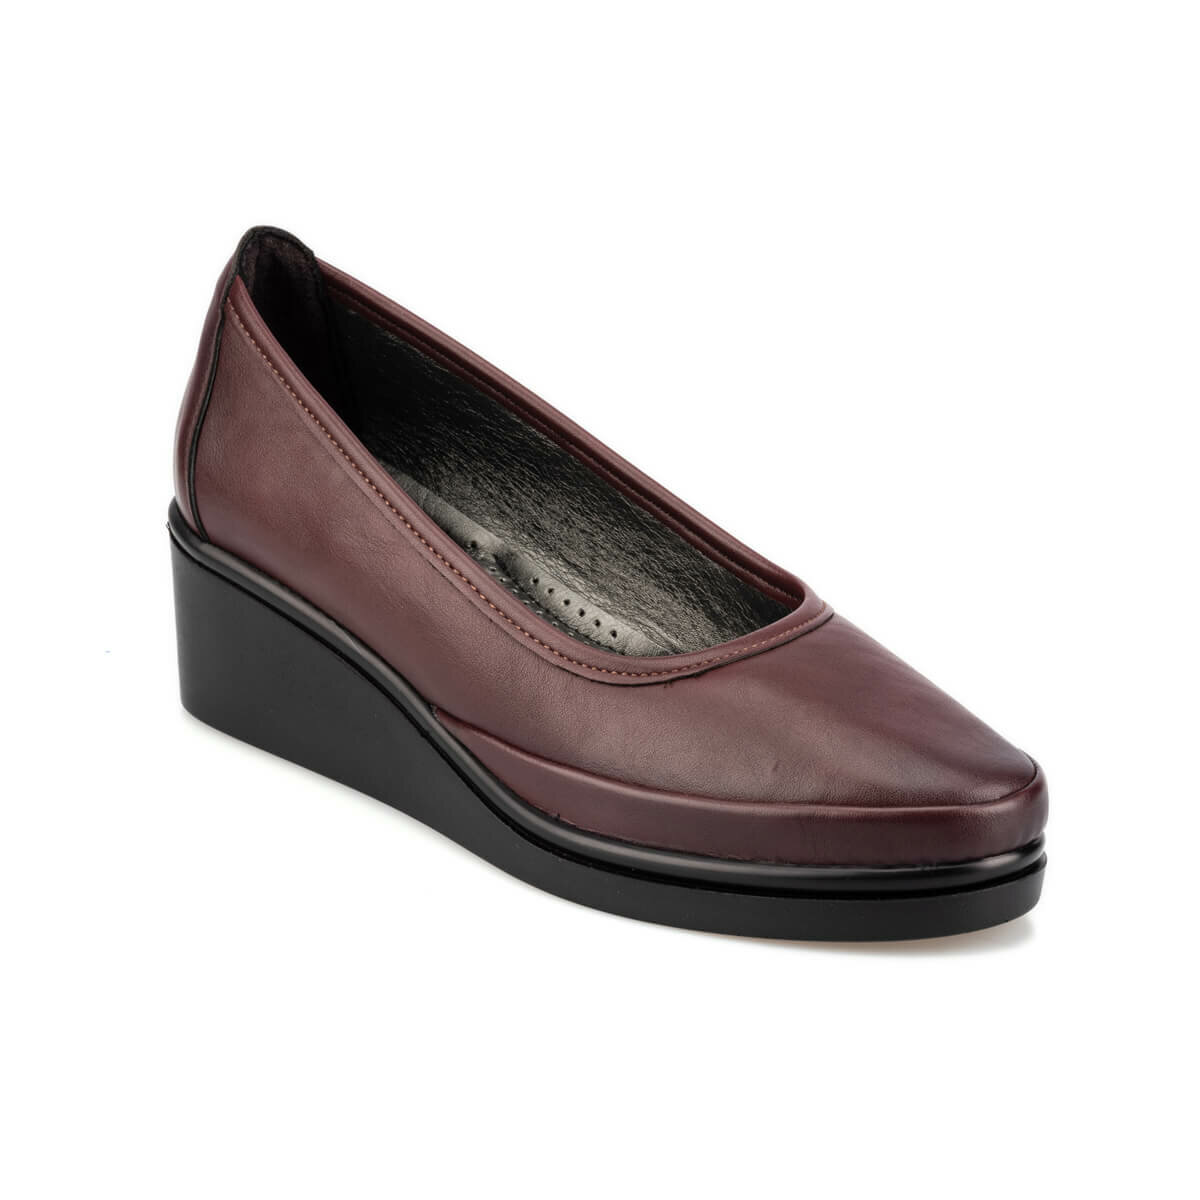 FLO 92.151038.Z Burgundy Women 'S Wedges Shoes Polaris